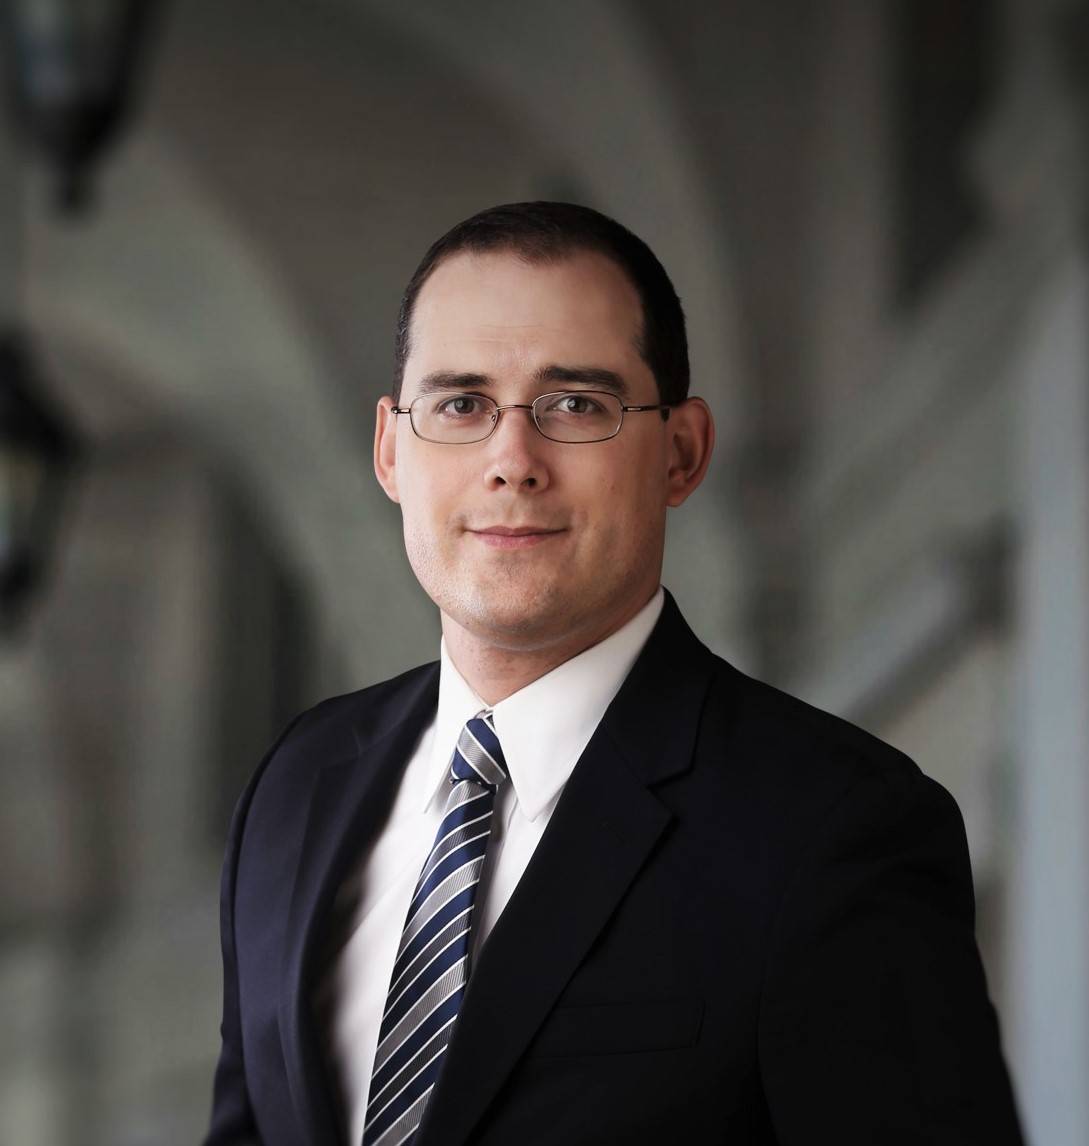 Marco Fernandes, financial advisor Englewood NJ